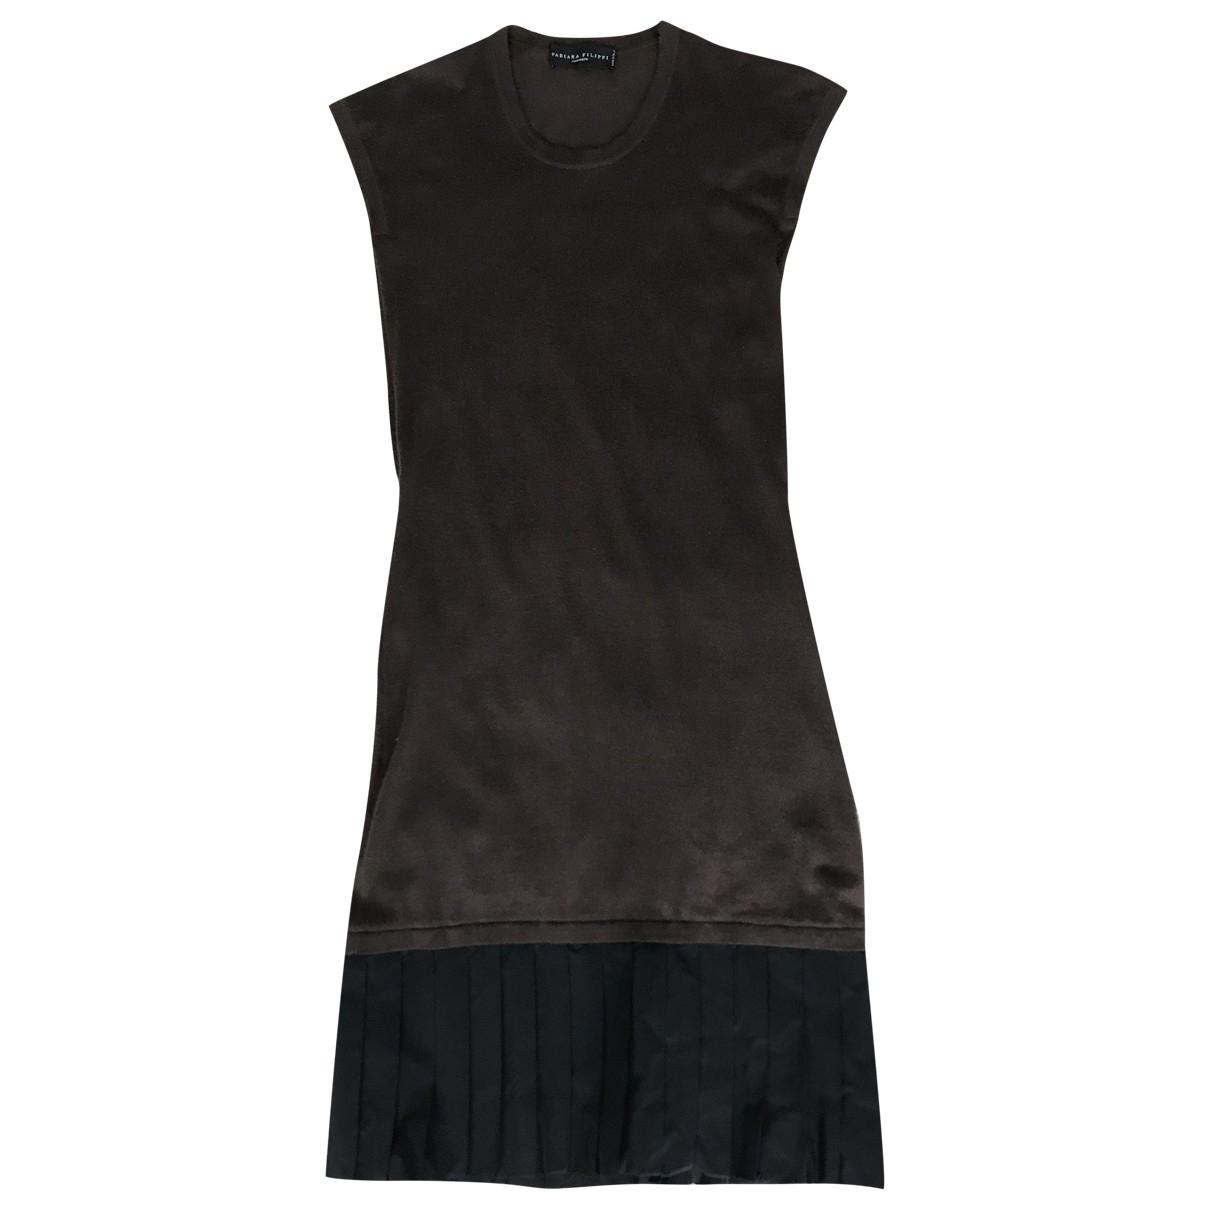 Fabiana Filippi \N Brown Cashmere dress for Women 44 IT